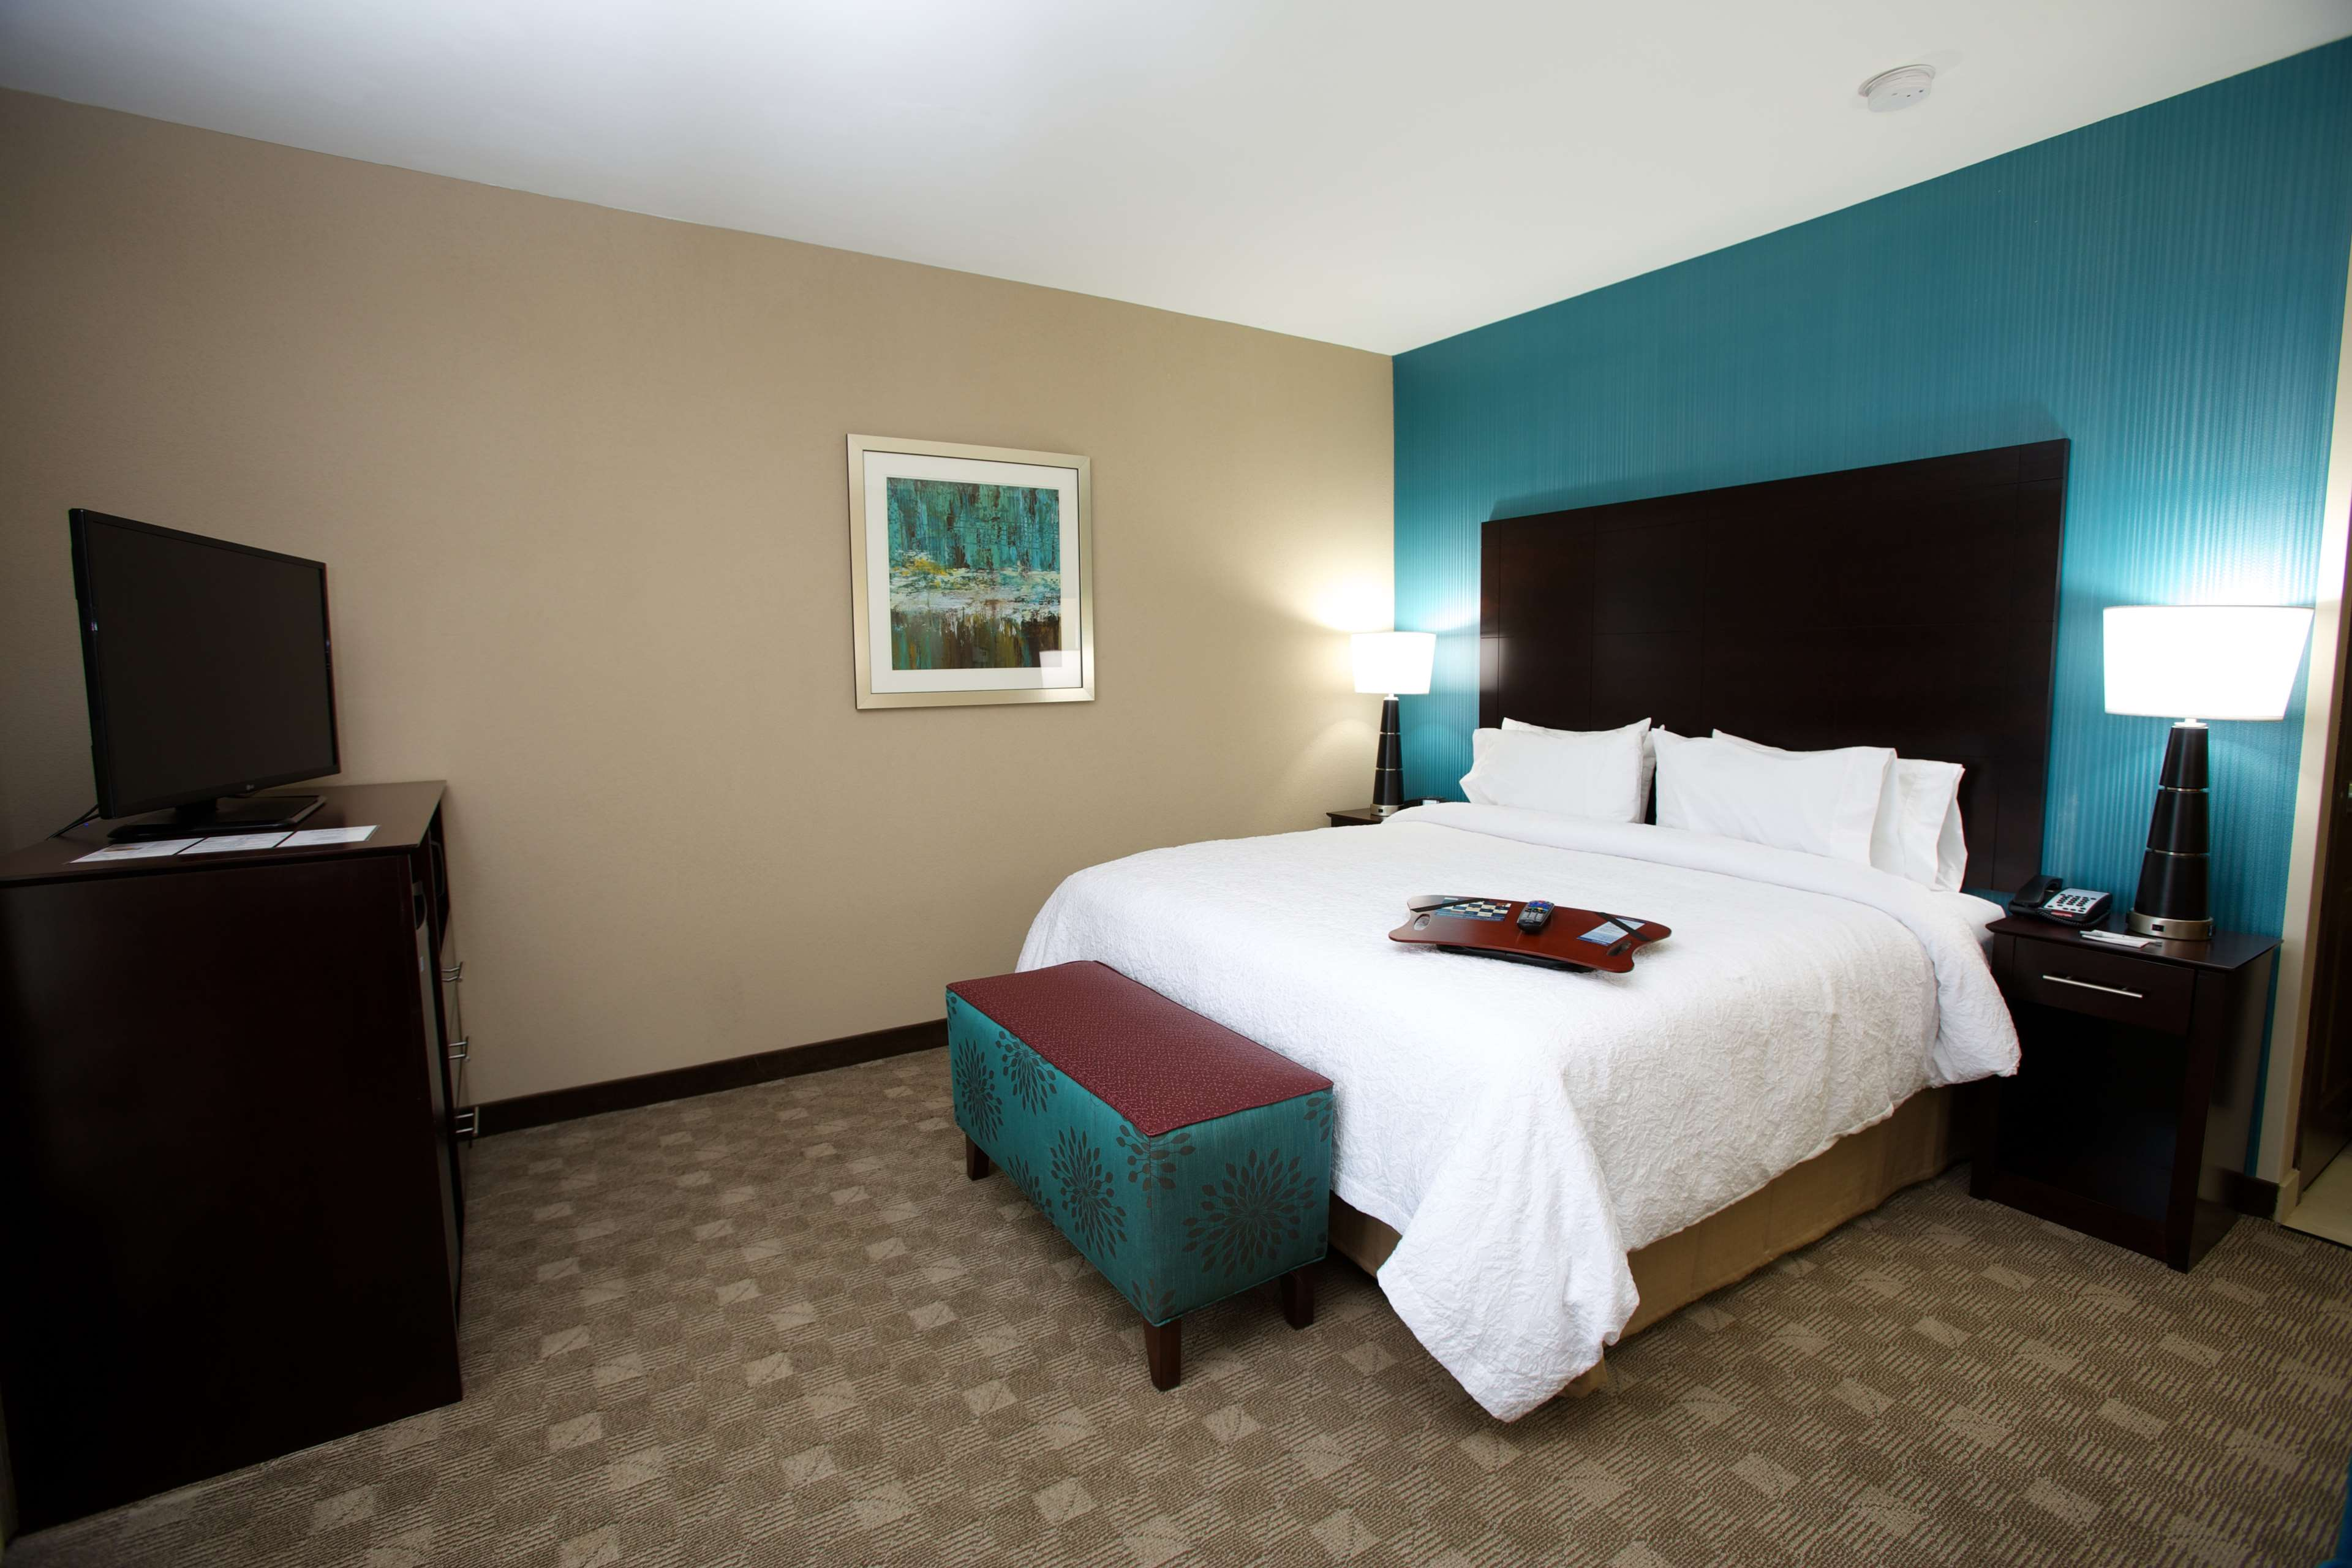 Hampton Inn & Suites Missouri City, TX image 32